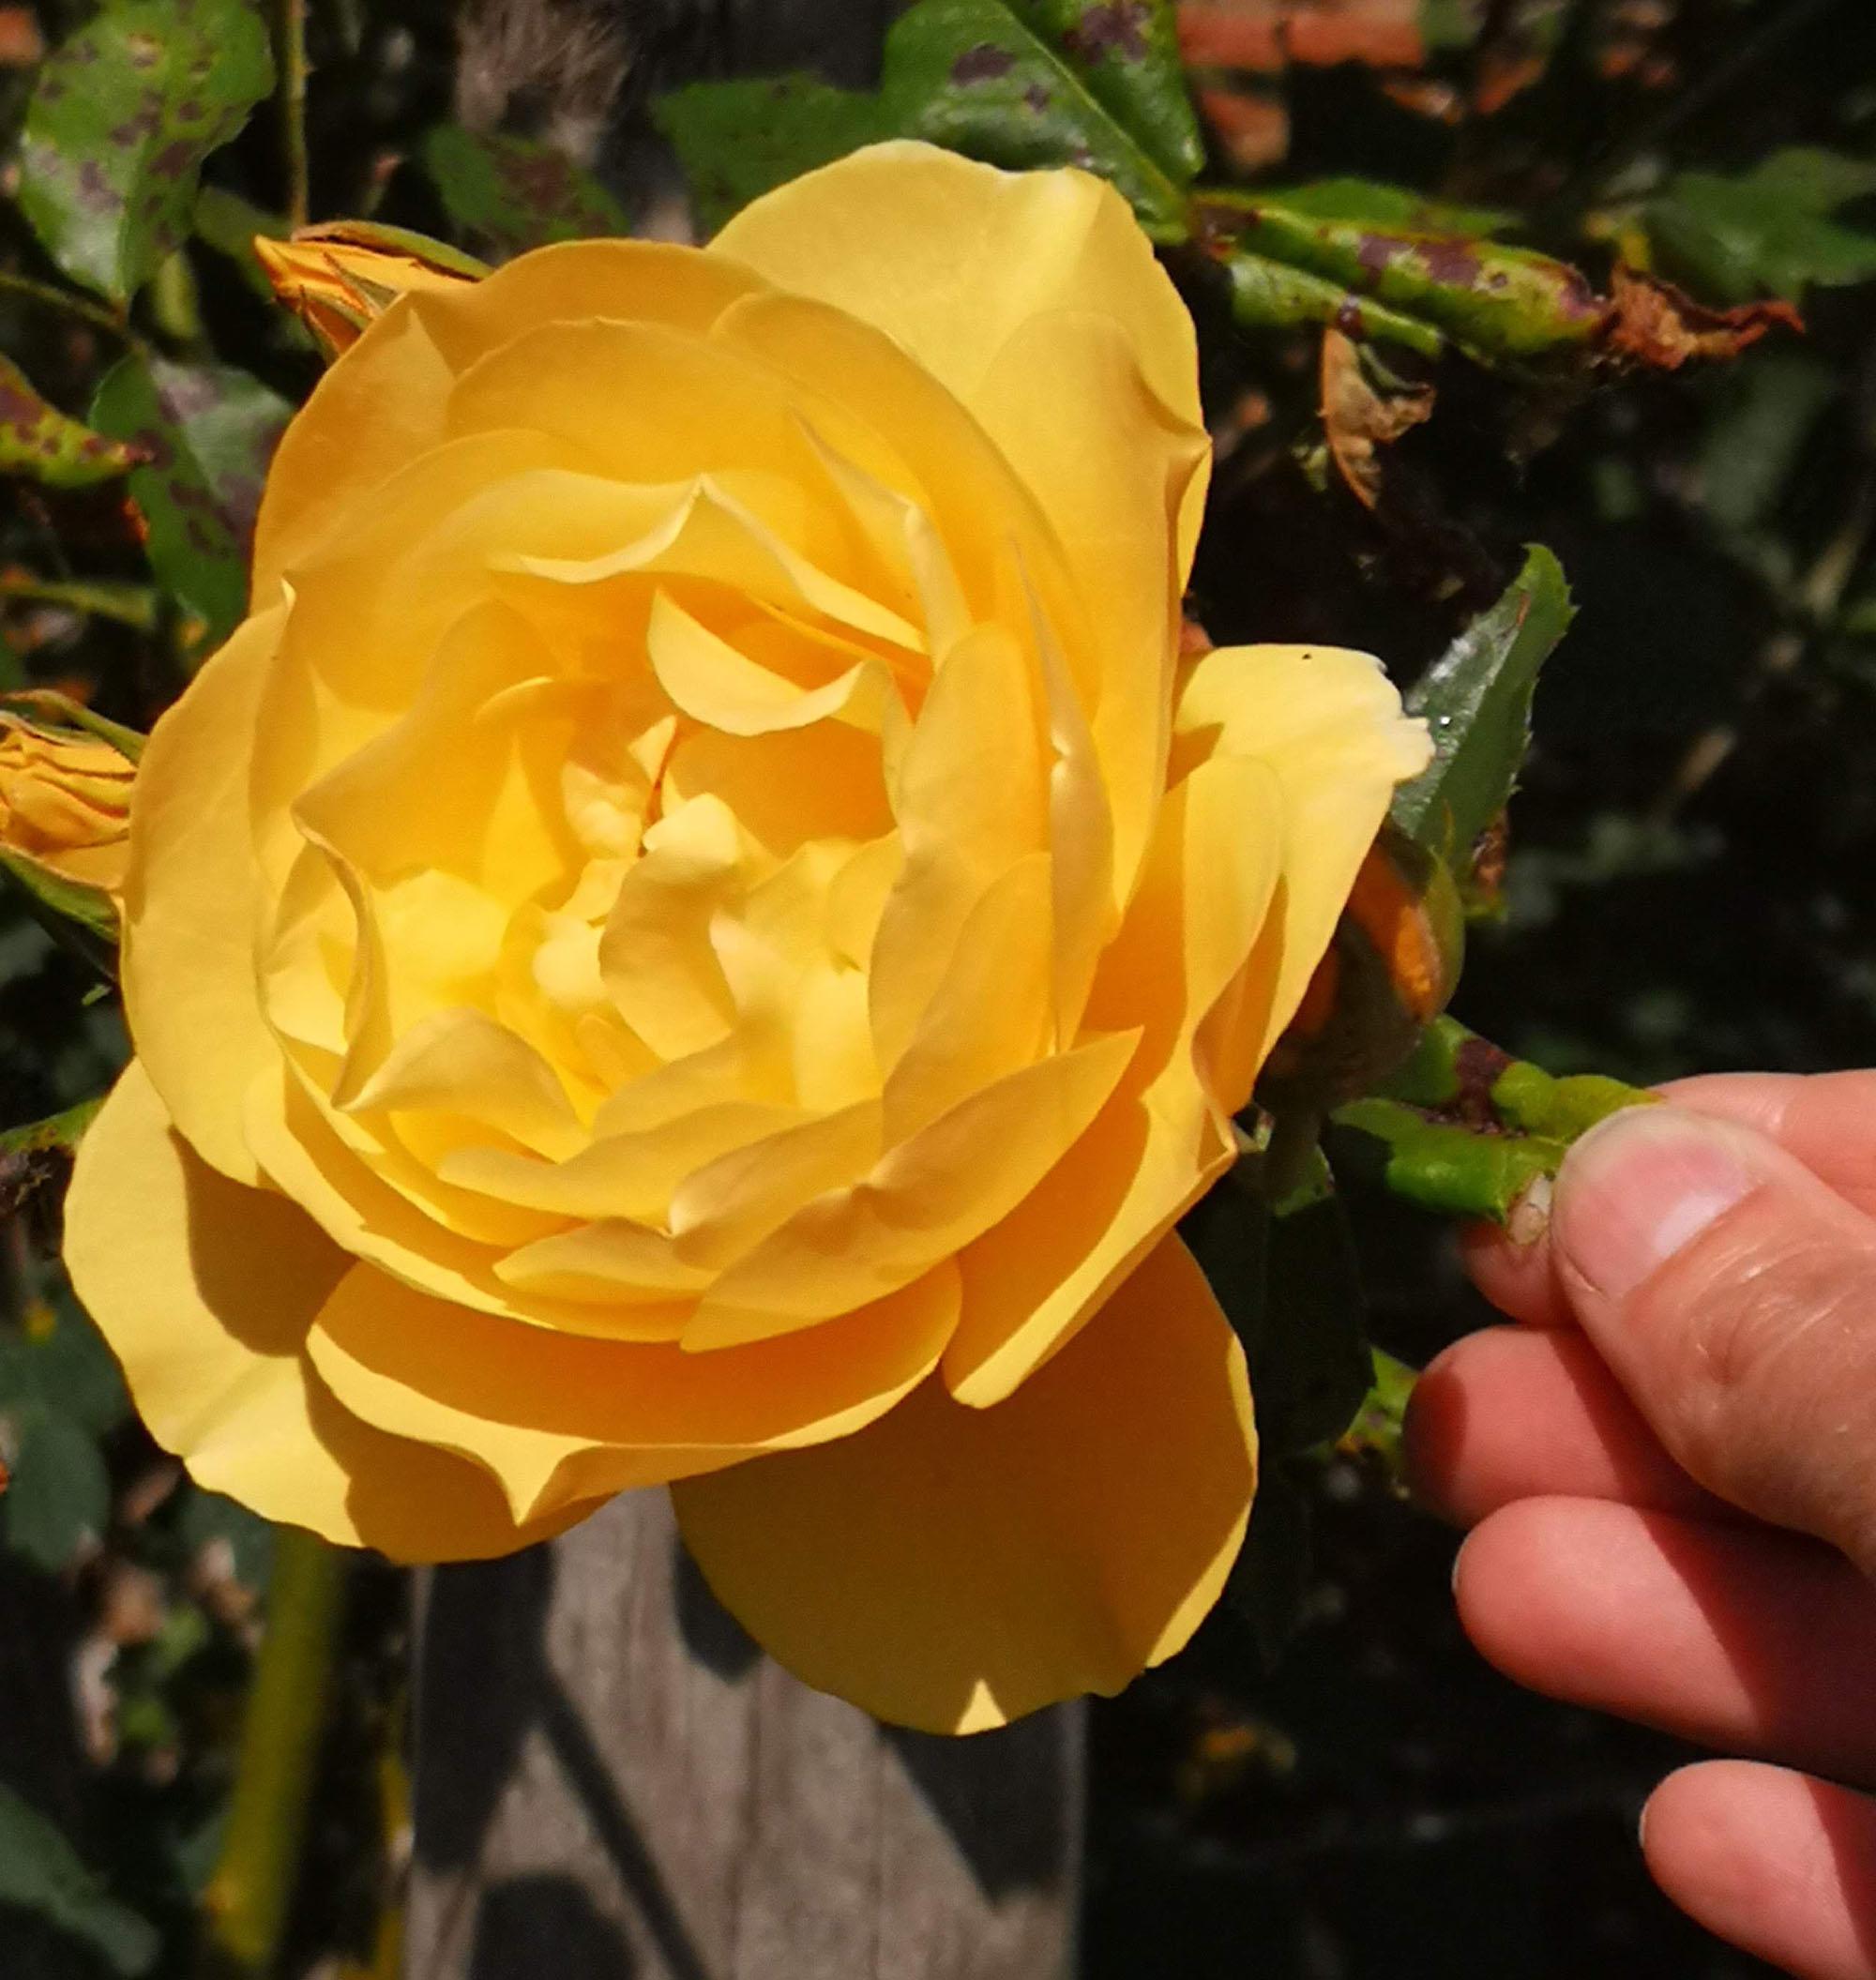 Abbotsford gardens yellow rose.jpg